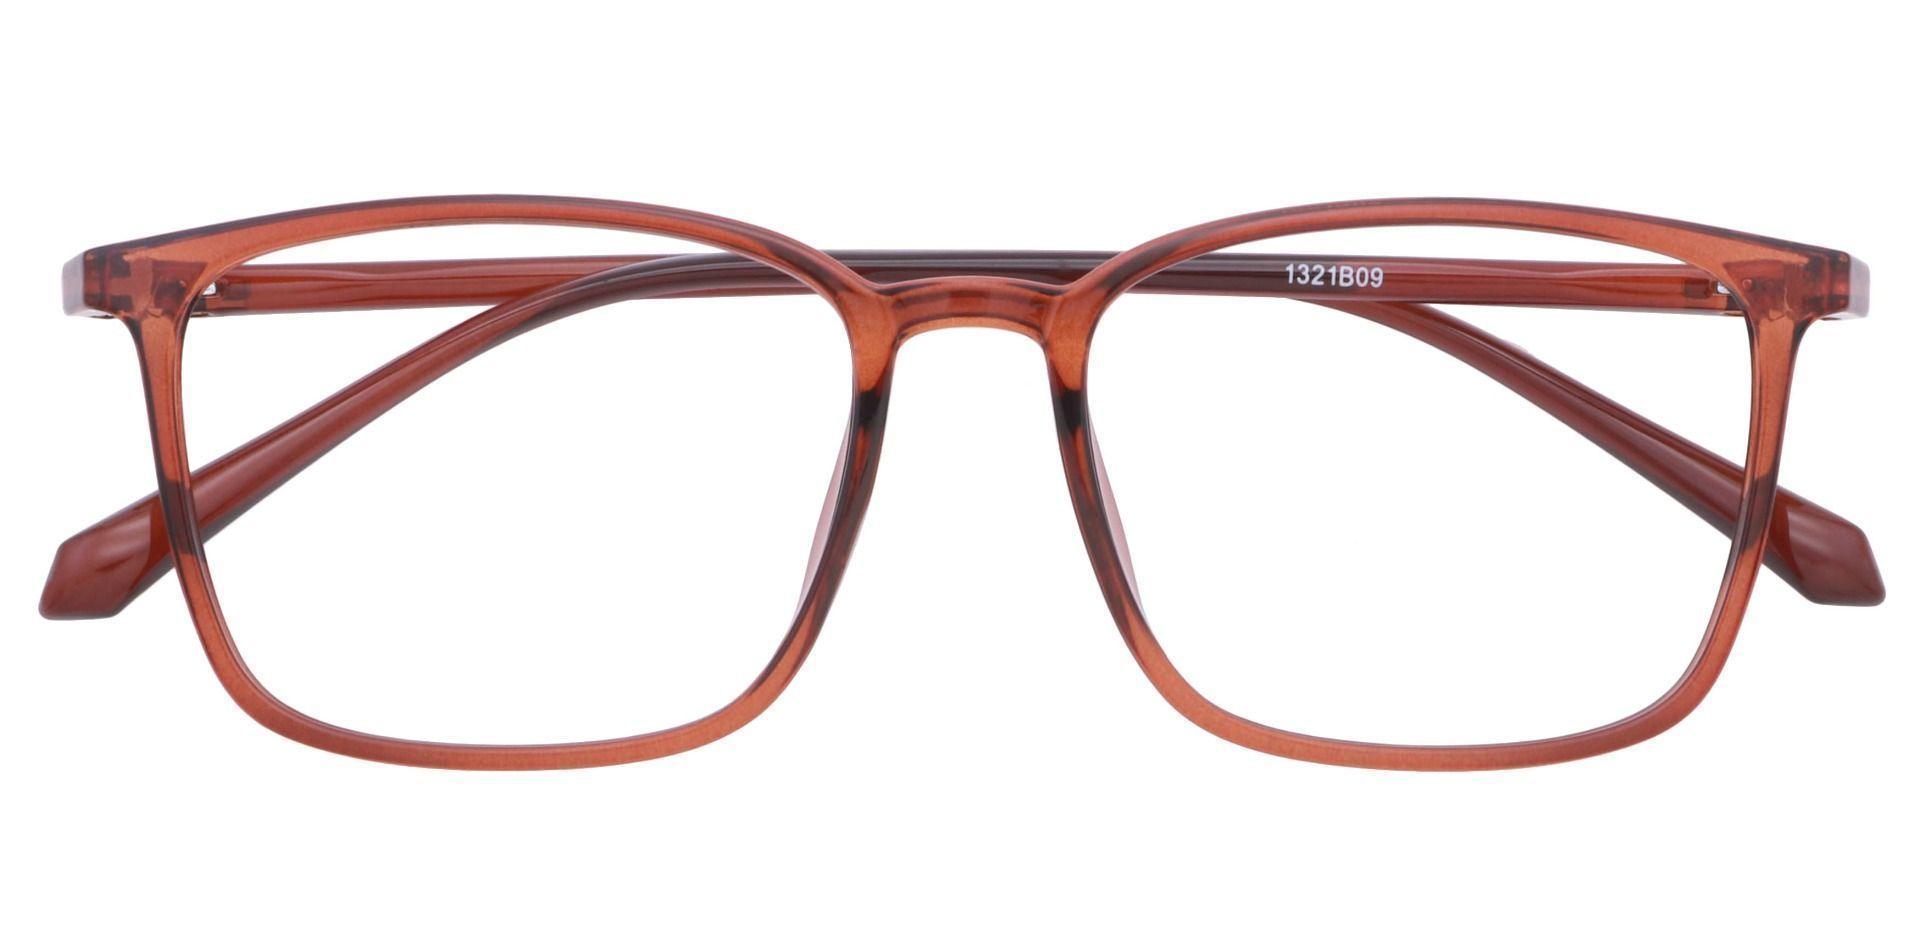 Hayworth Rectangle Eyeglasses Frame - Brown